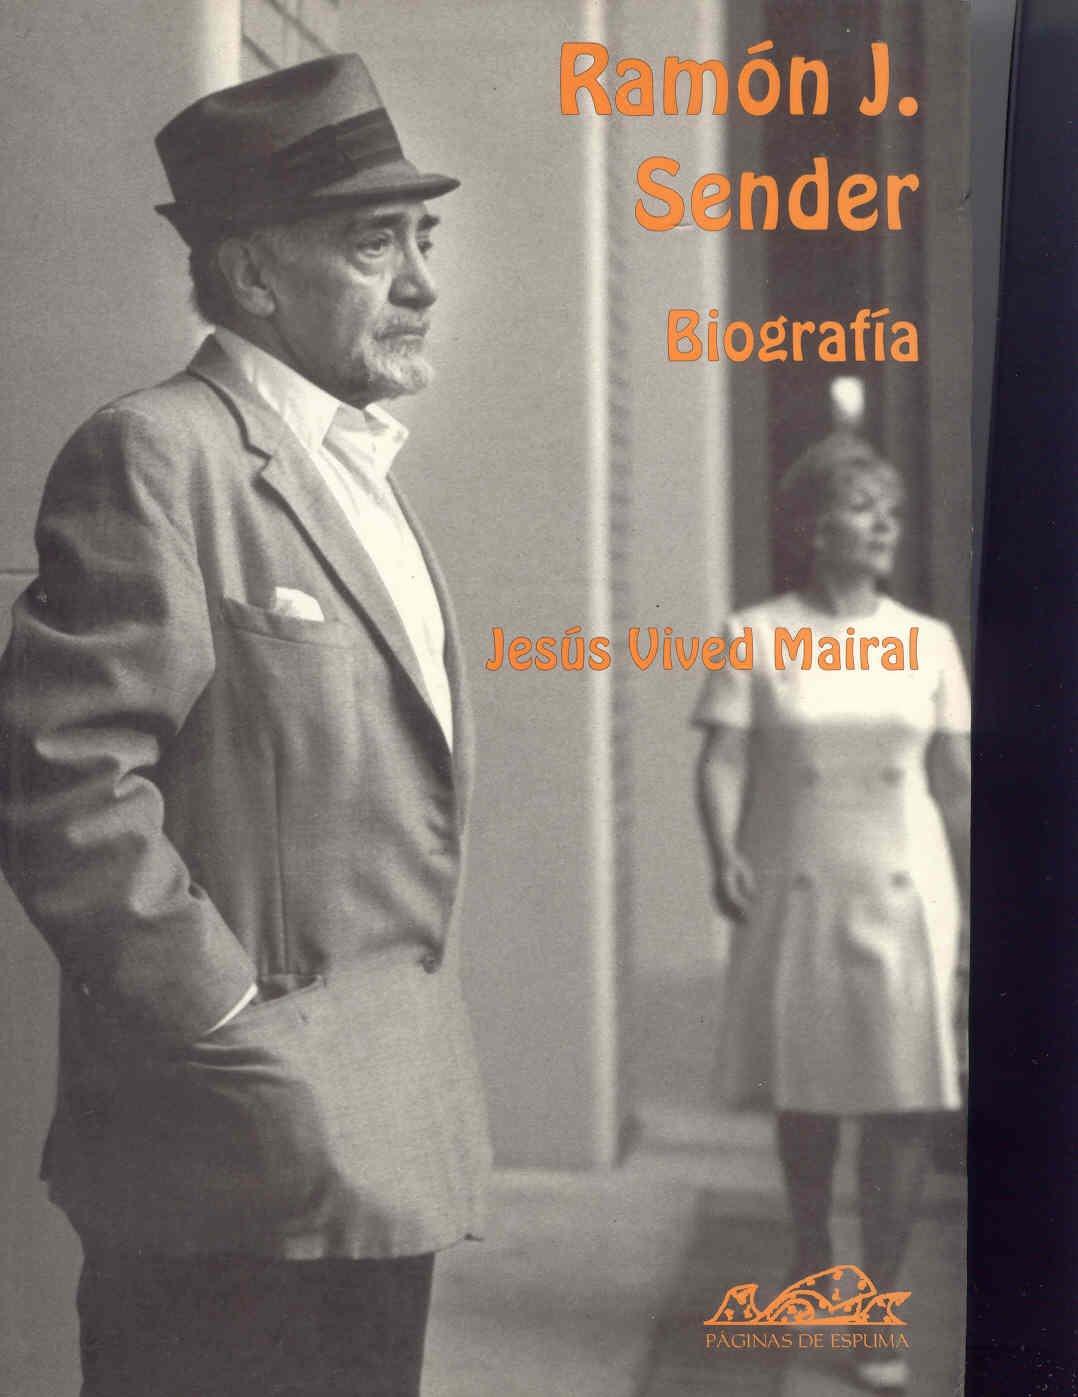 Ramón J. Sender: Biografía (Voces/ Ensayo): Amazon.es: Jesús Vived Mairal: Libros